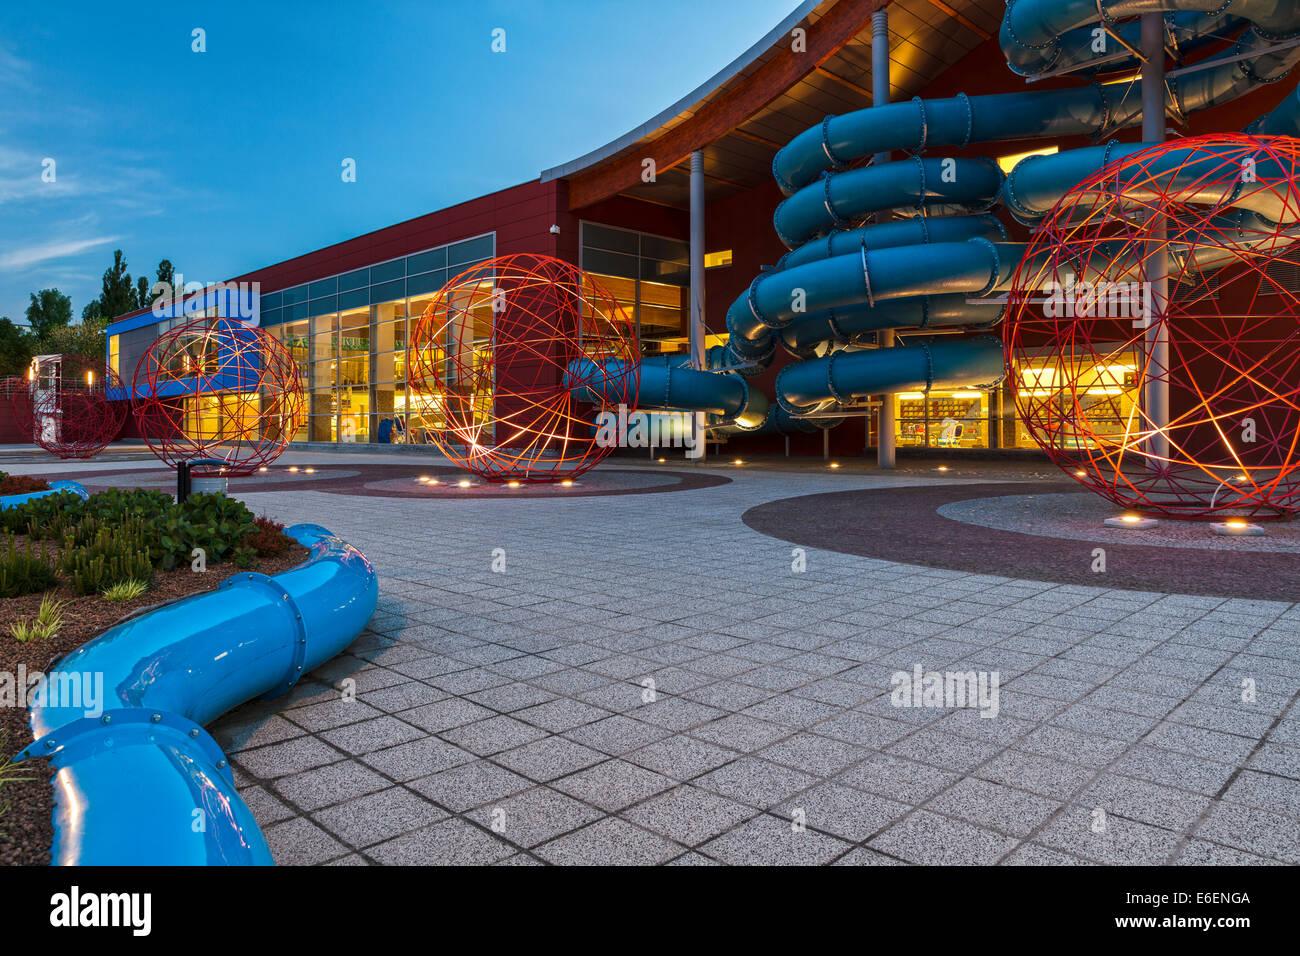 Olympic swimming pool in Olsztyn, Poland - Stock Image